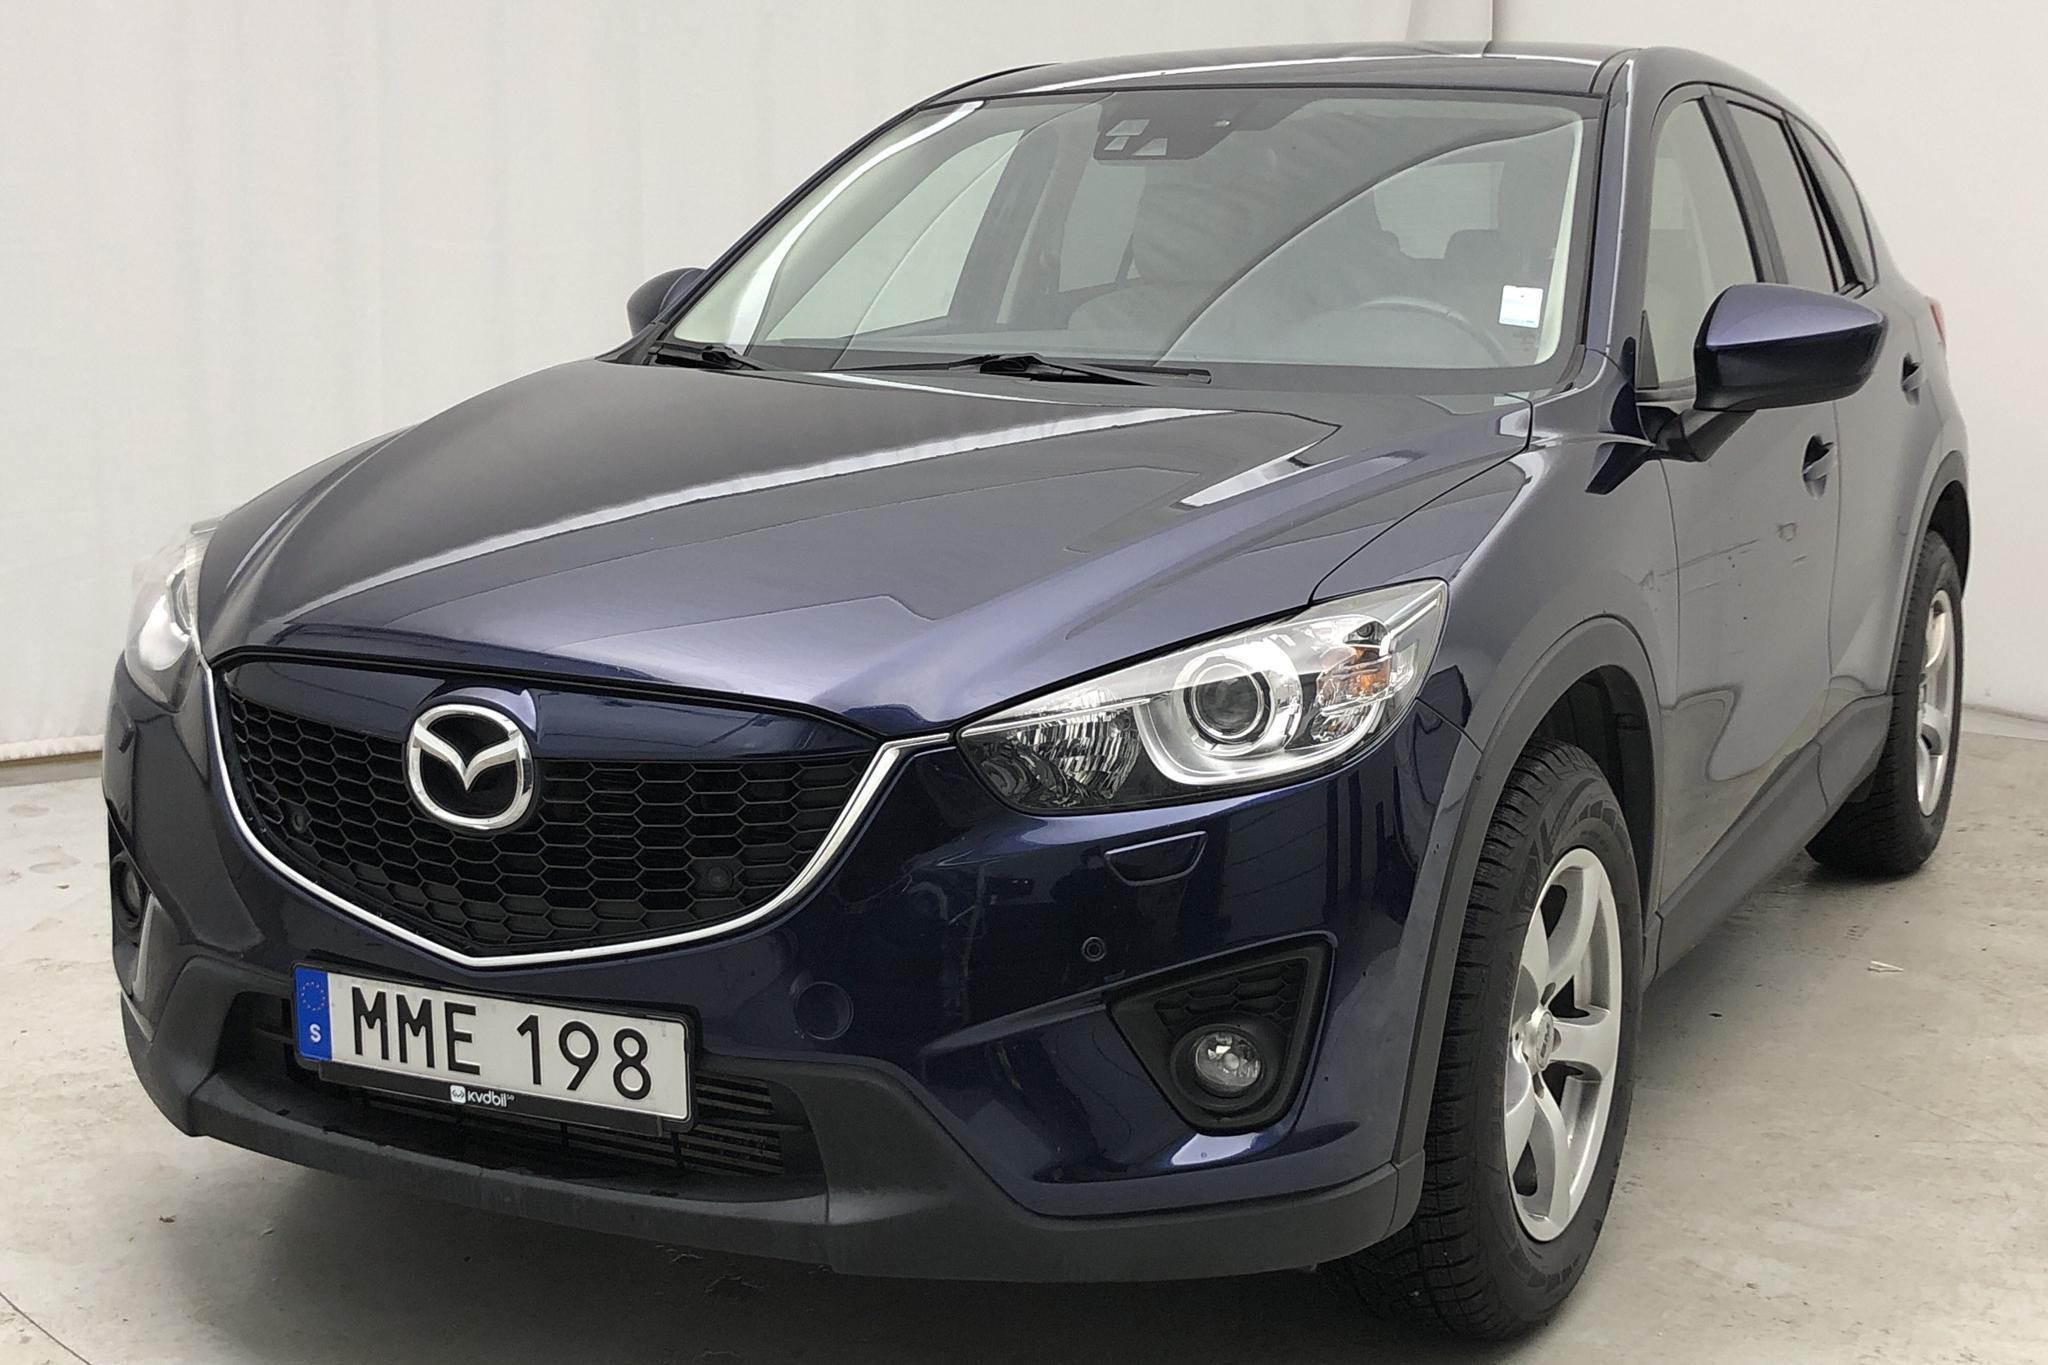 Mazda CX-5 2.2 DE AUT, Navi, Skinn AWD (175hk) - 12 380 mil - Automat - blå - 2014